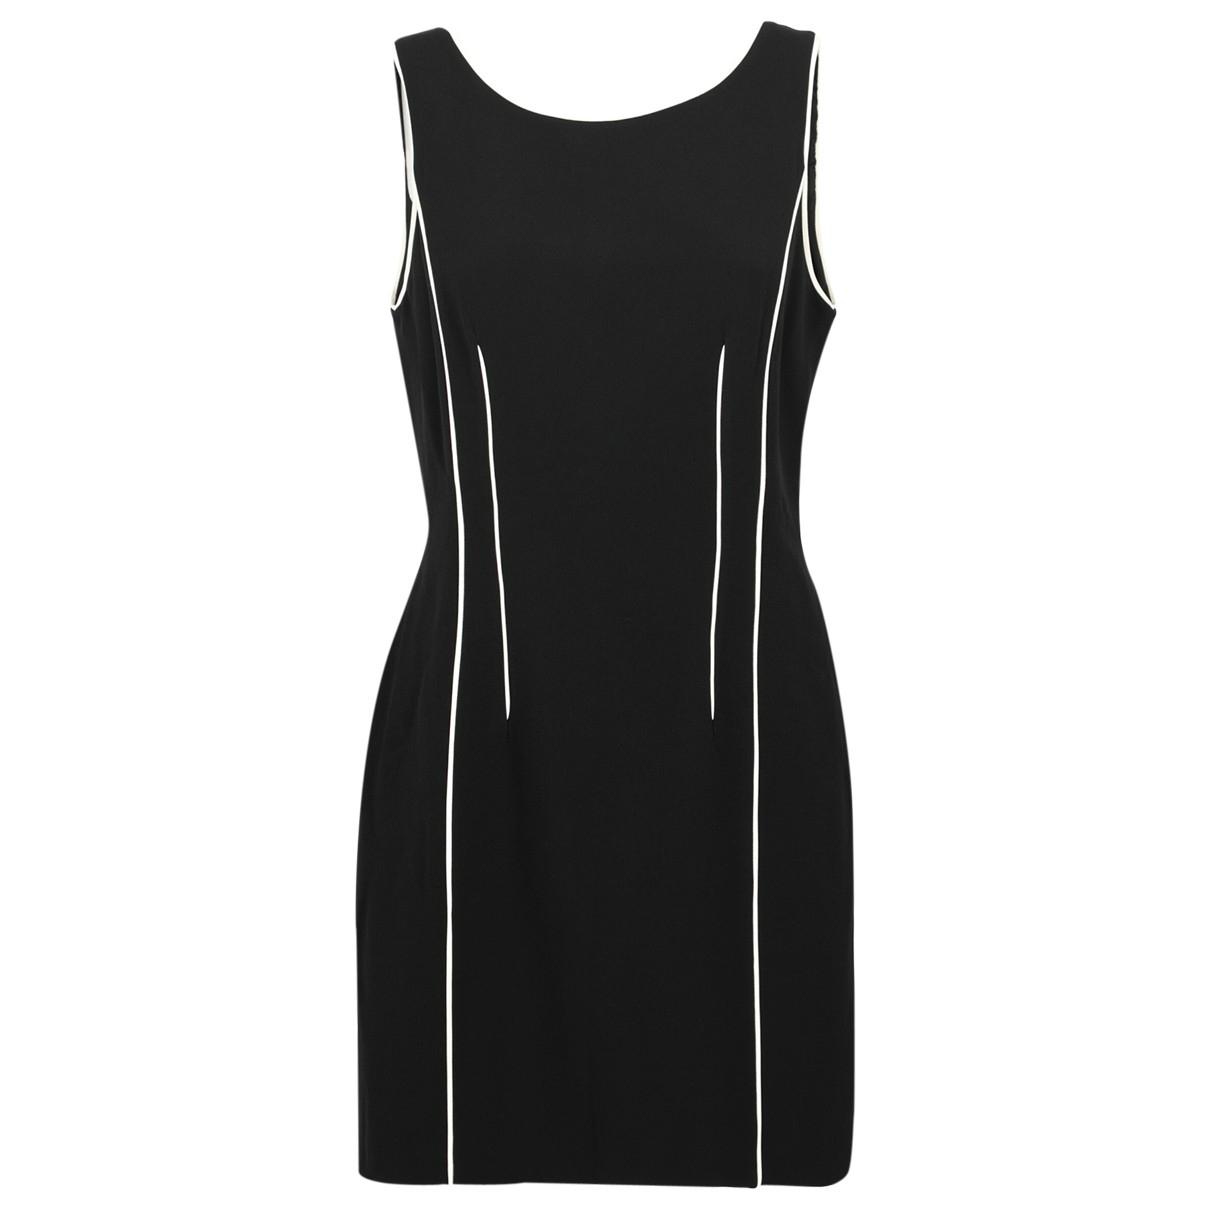 Moschino \N Black dress for Women 46 IT